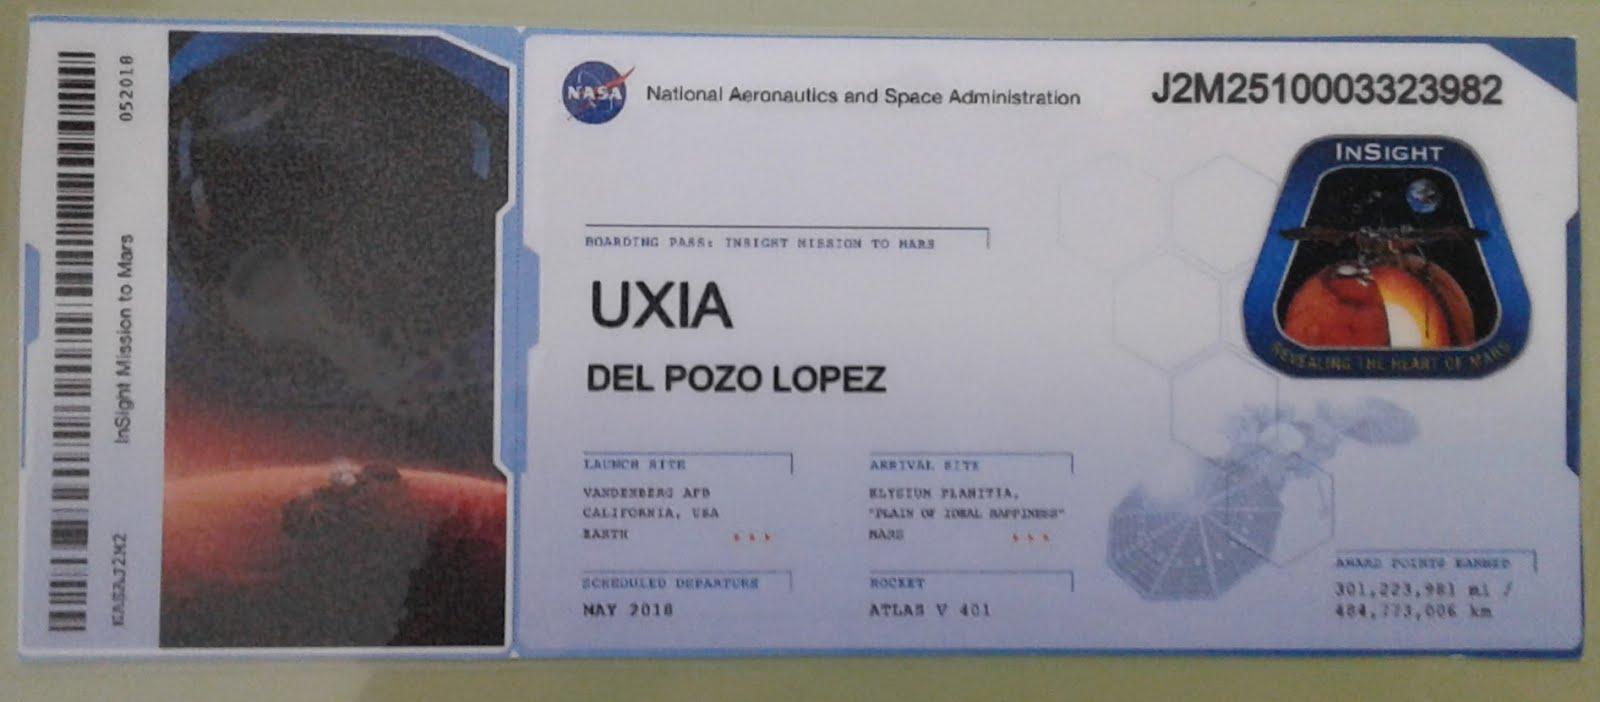 Ímonos a Marte, vides?